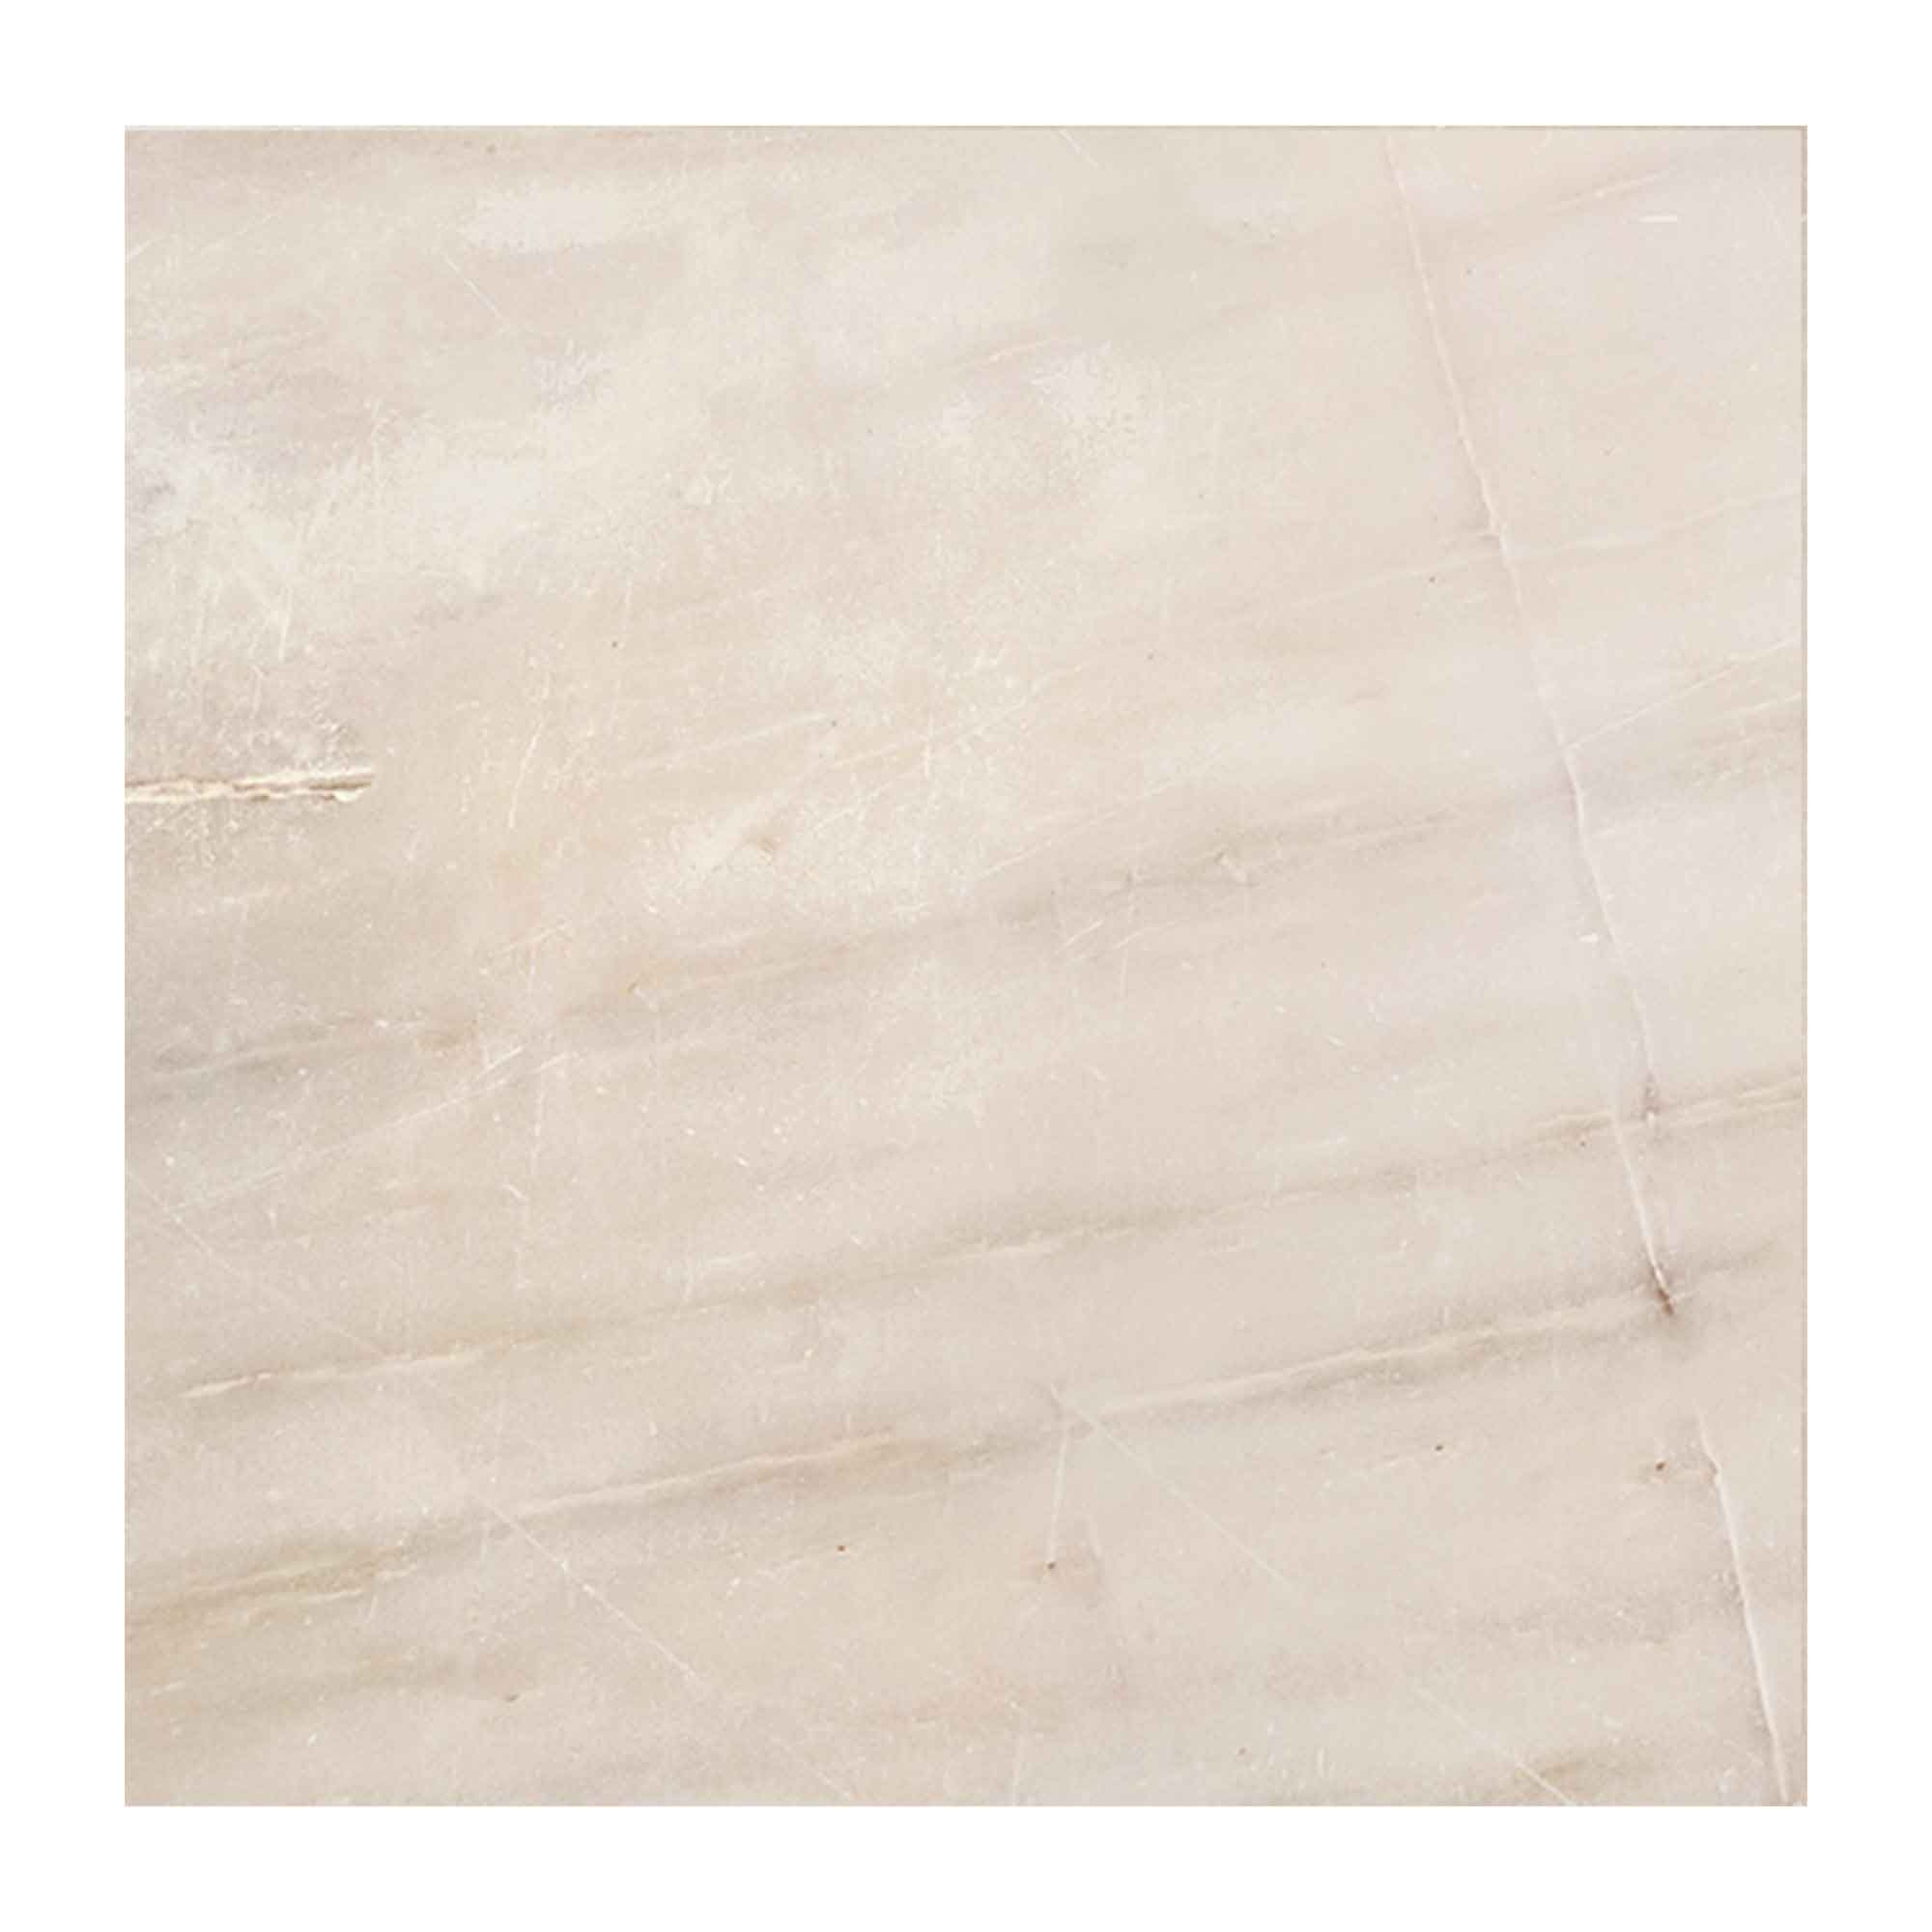 Gresie portelanata Cesarom Soft PEI 4, bej mat, patrata, 33 x 33 cm imagine 2021 mathaus